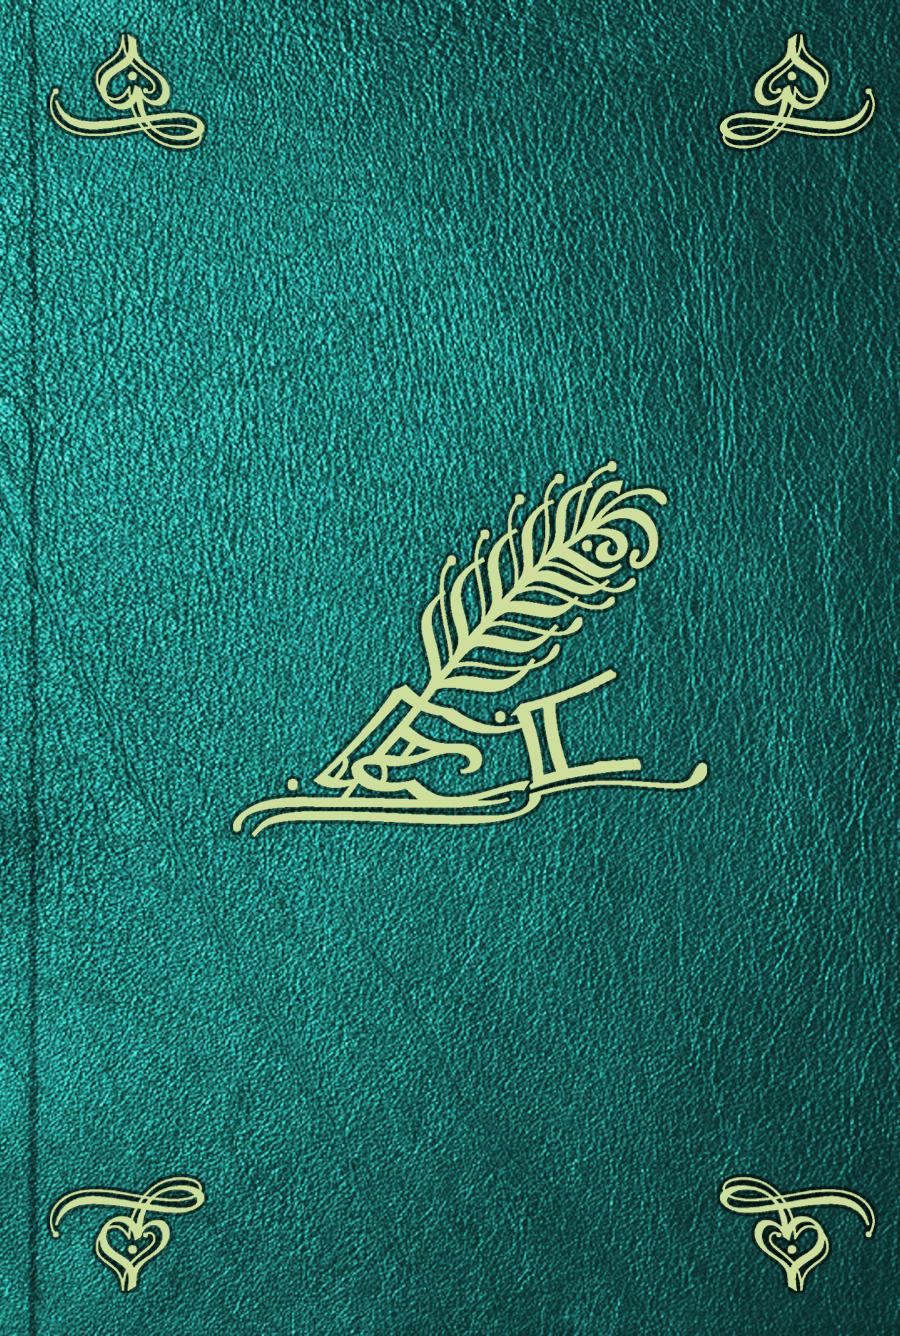 Pierre Loius Ginguené Storia della letteratura italiana. T. 8 pierre loius ginguené histoire littéraire d italie t 2